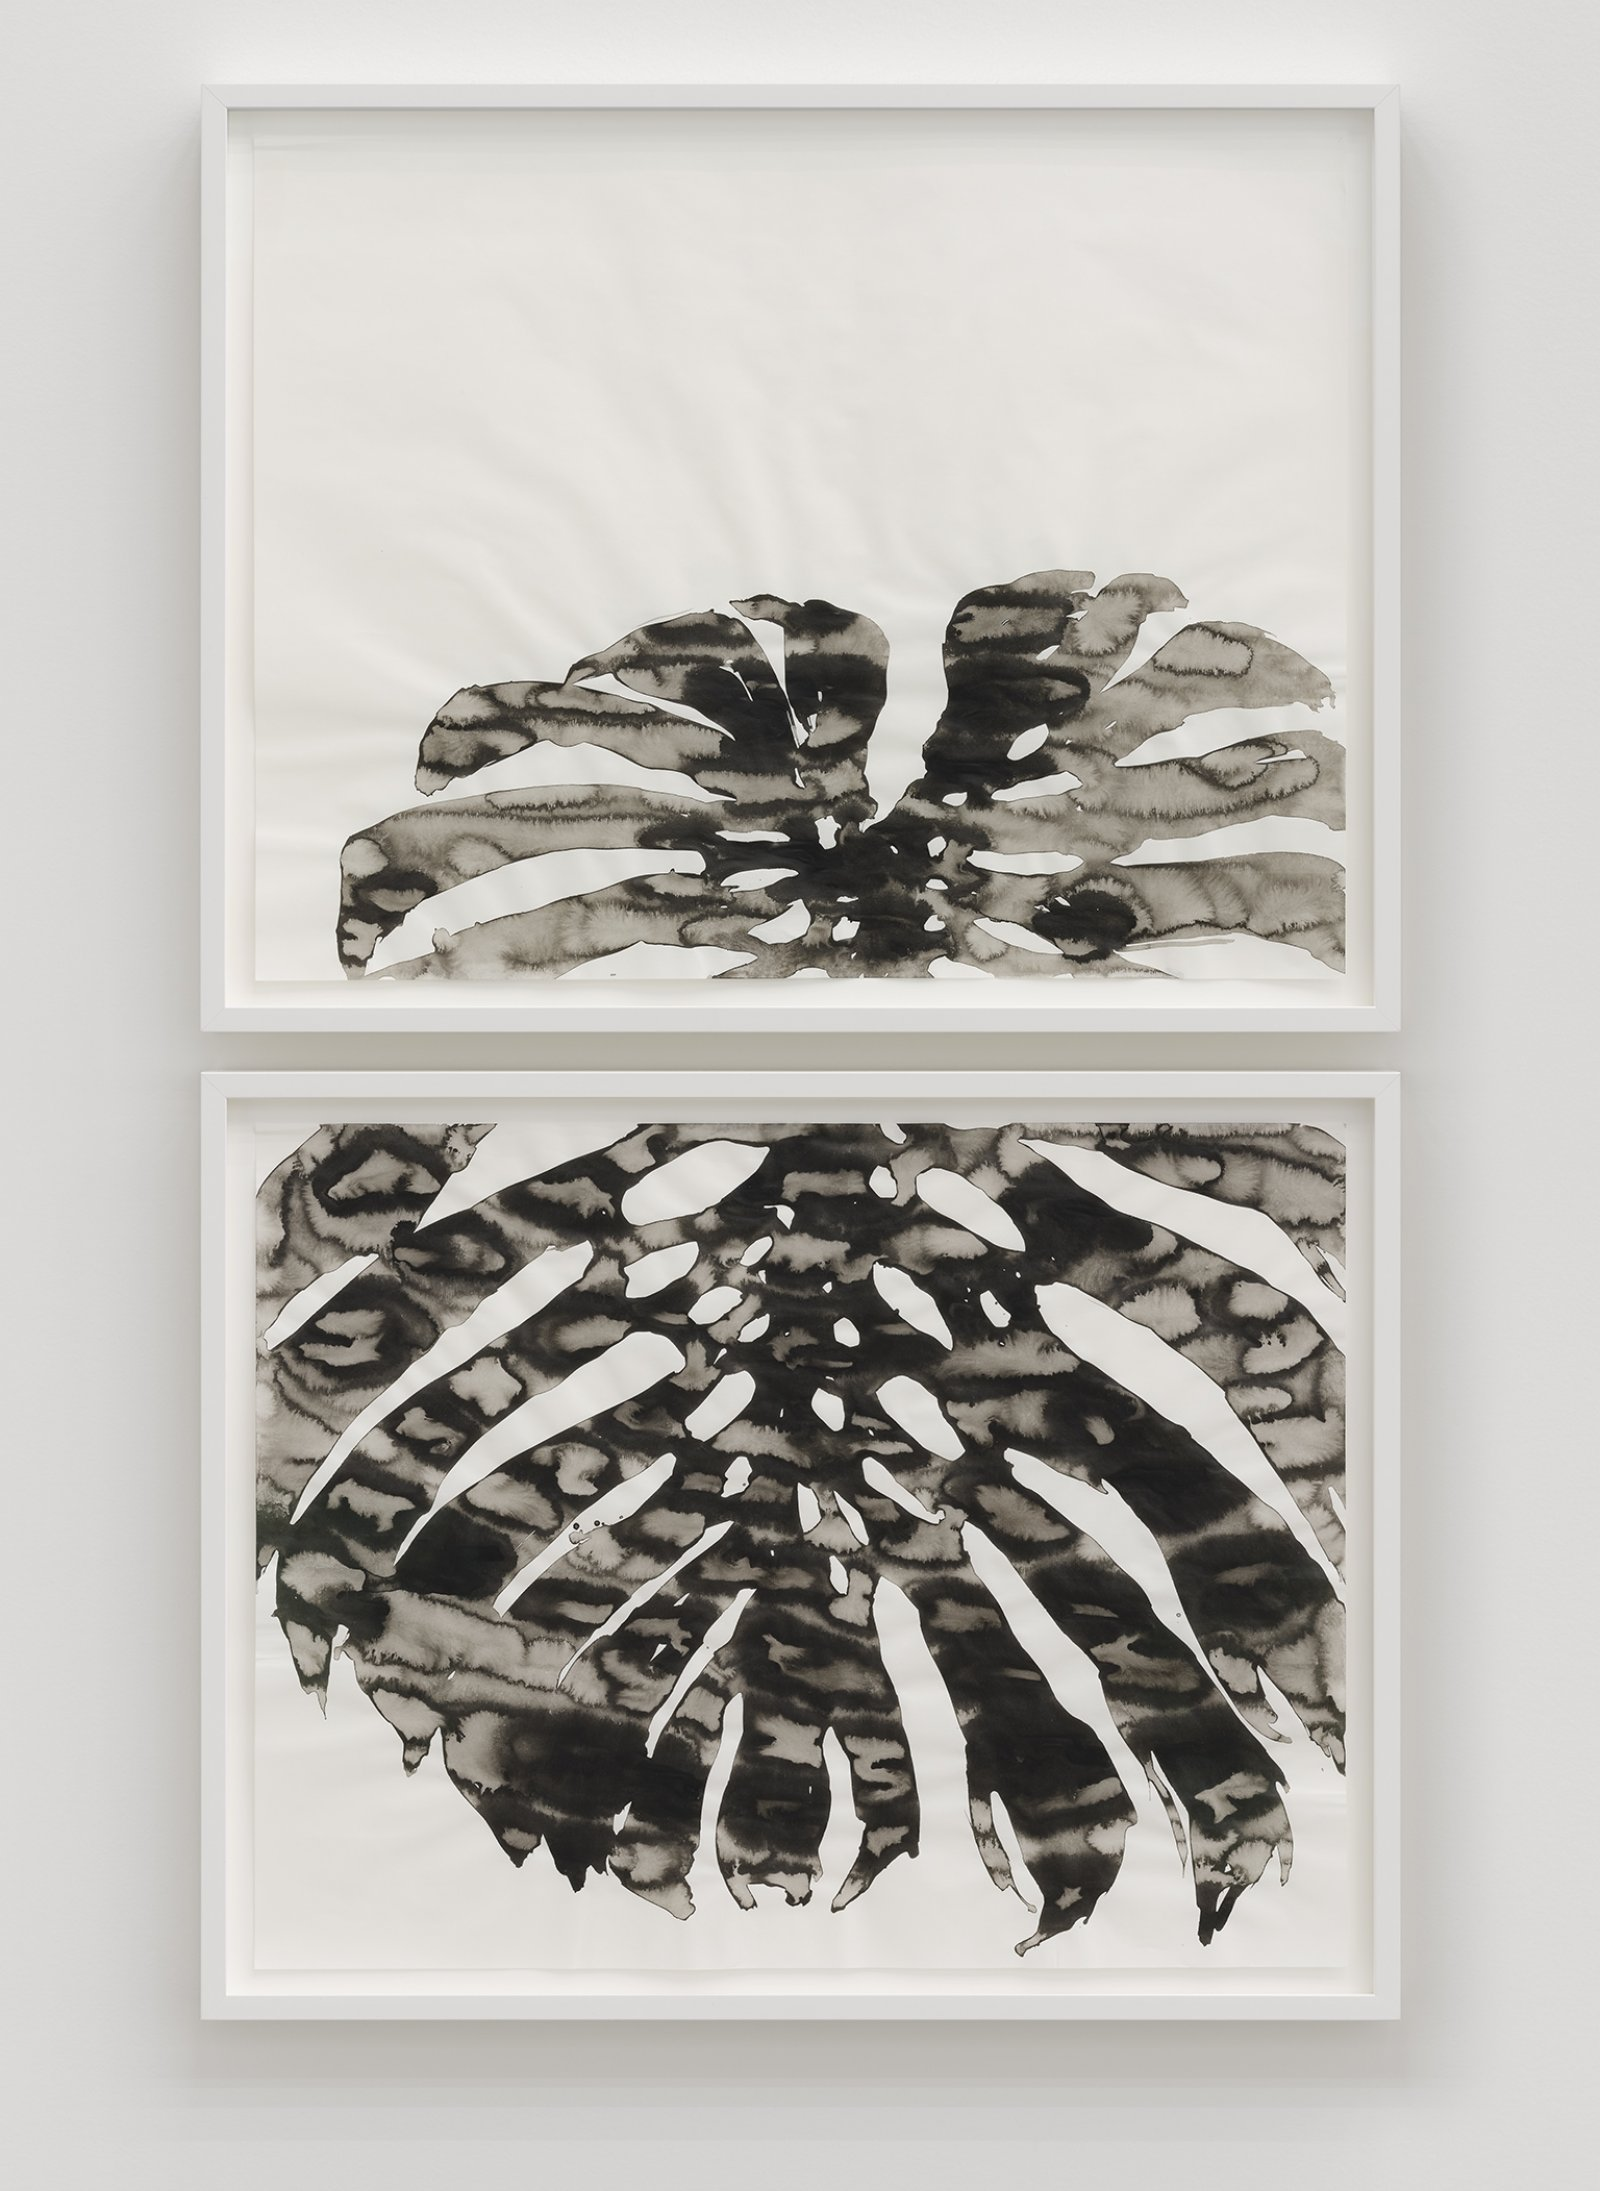 Abbas Akhavan, Monstera deliciosa (studio), 2017, ink on paper, diptych, each 22 x 28 in. (56 x 71 cm) by Abbas Akhavan